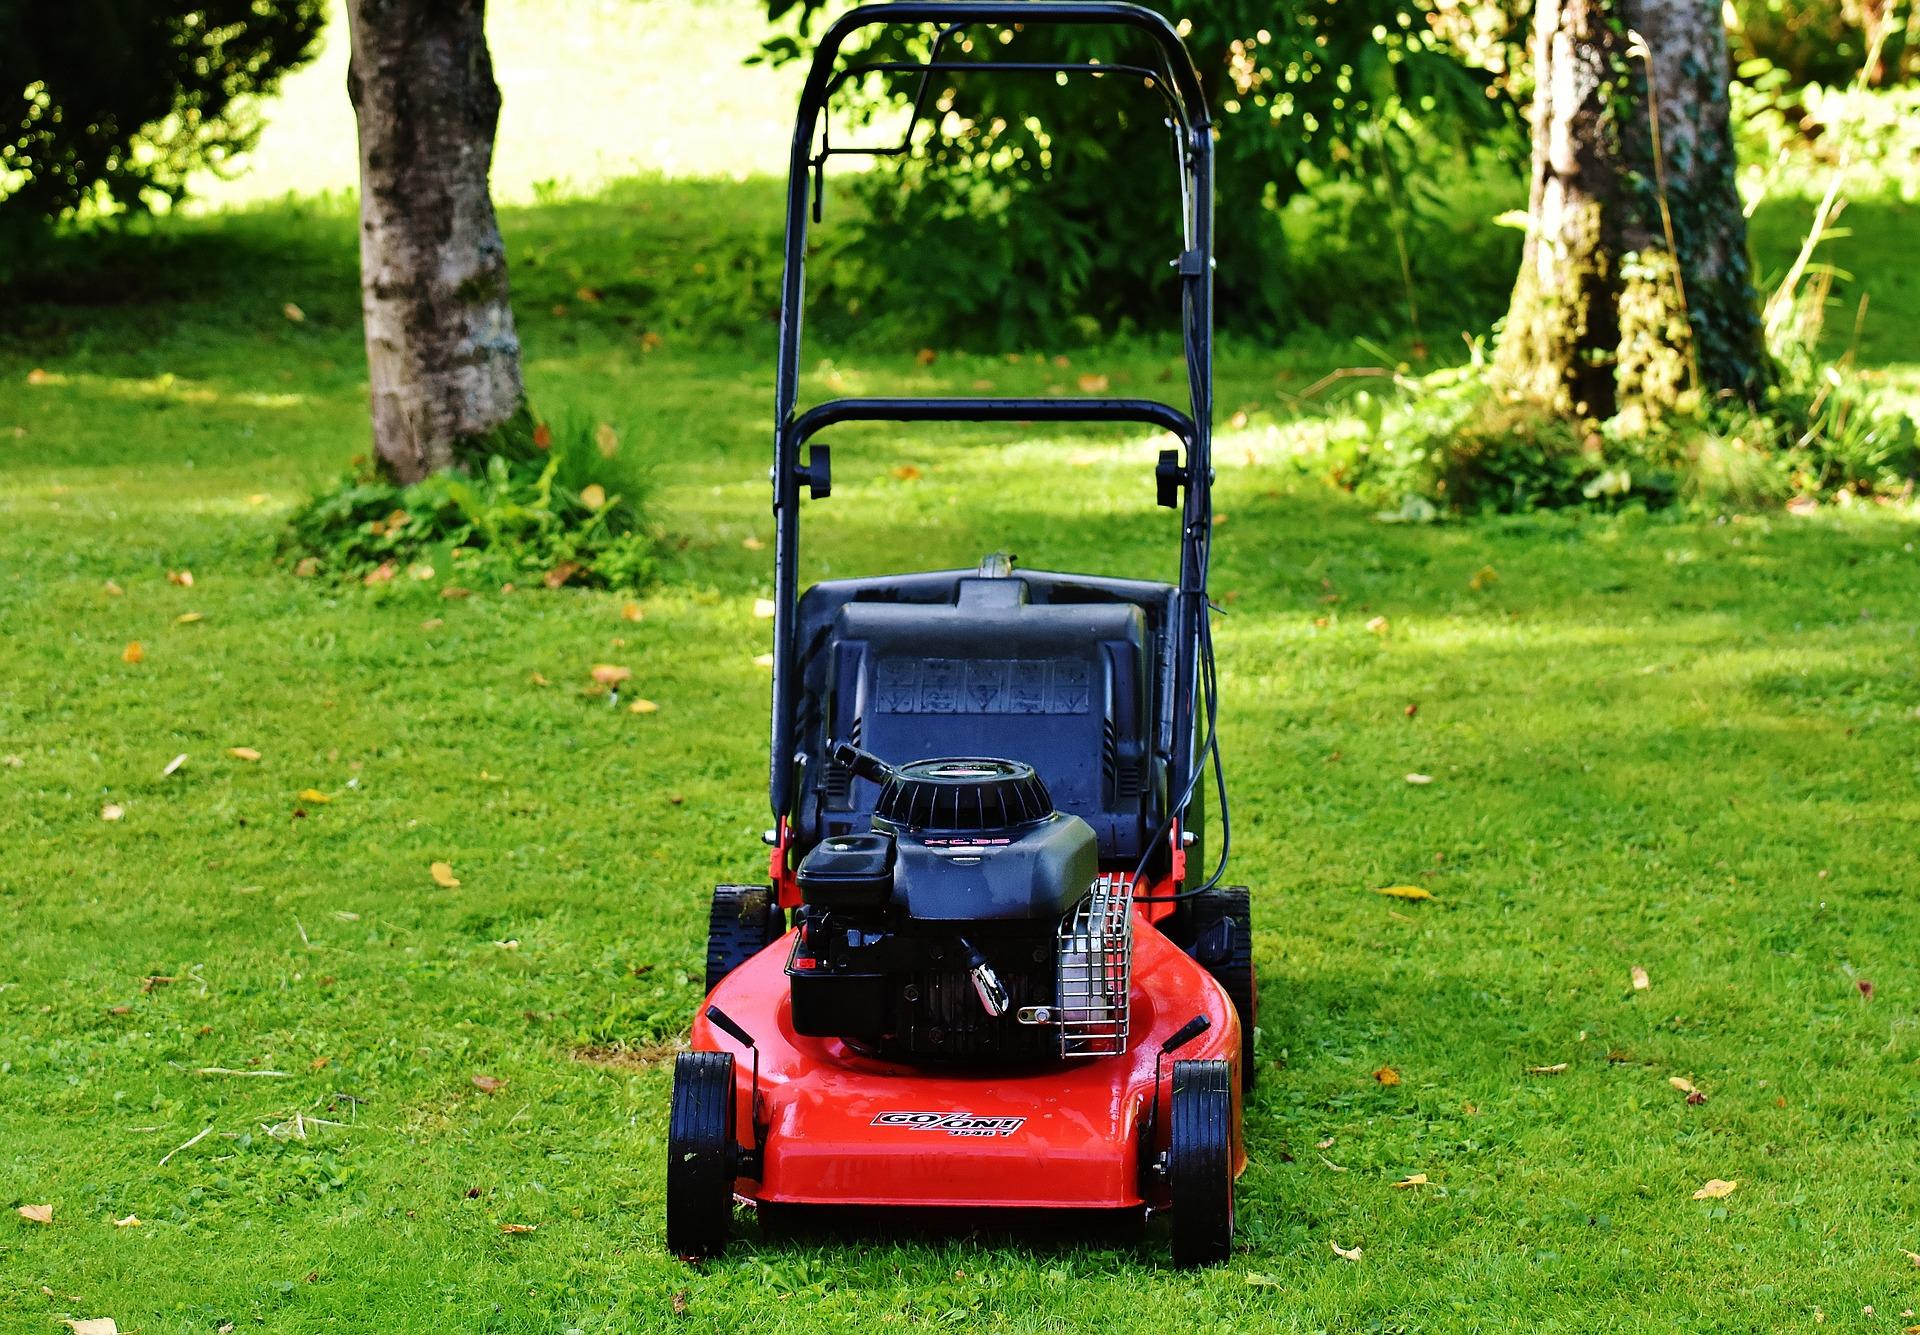 lawn-mower-1593890_1920